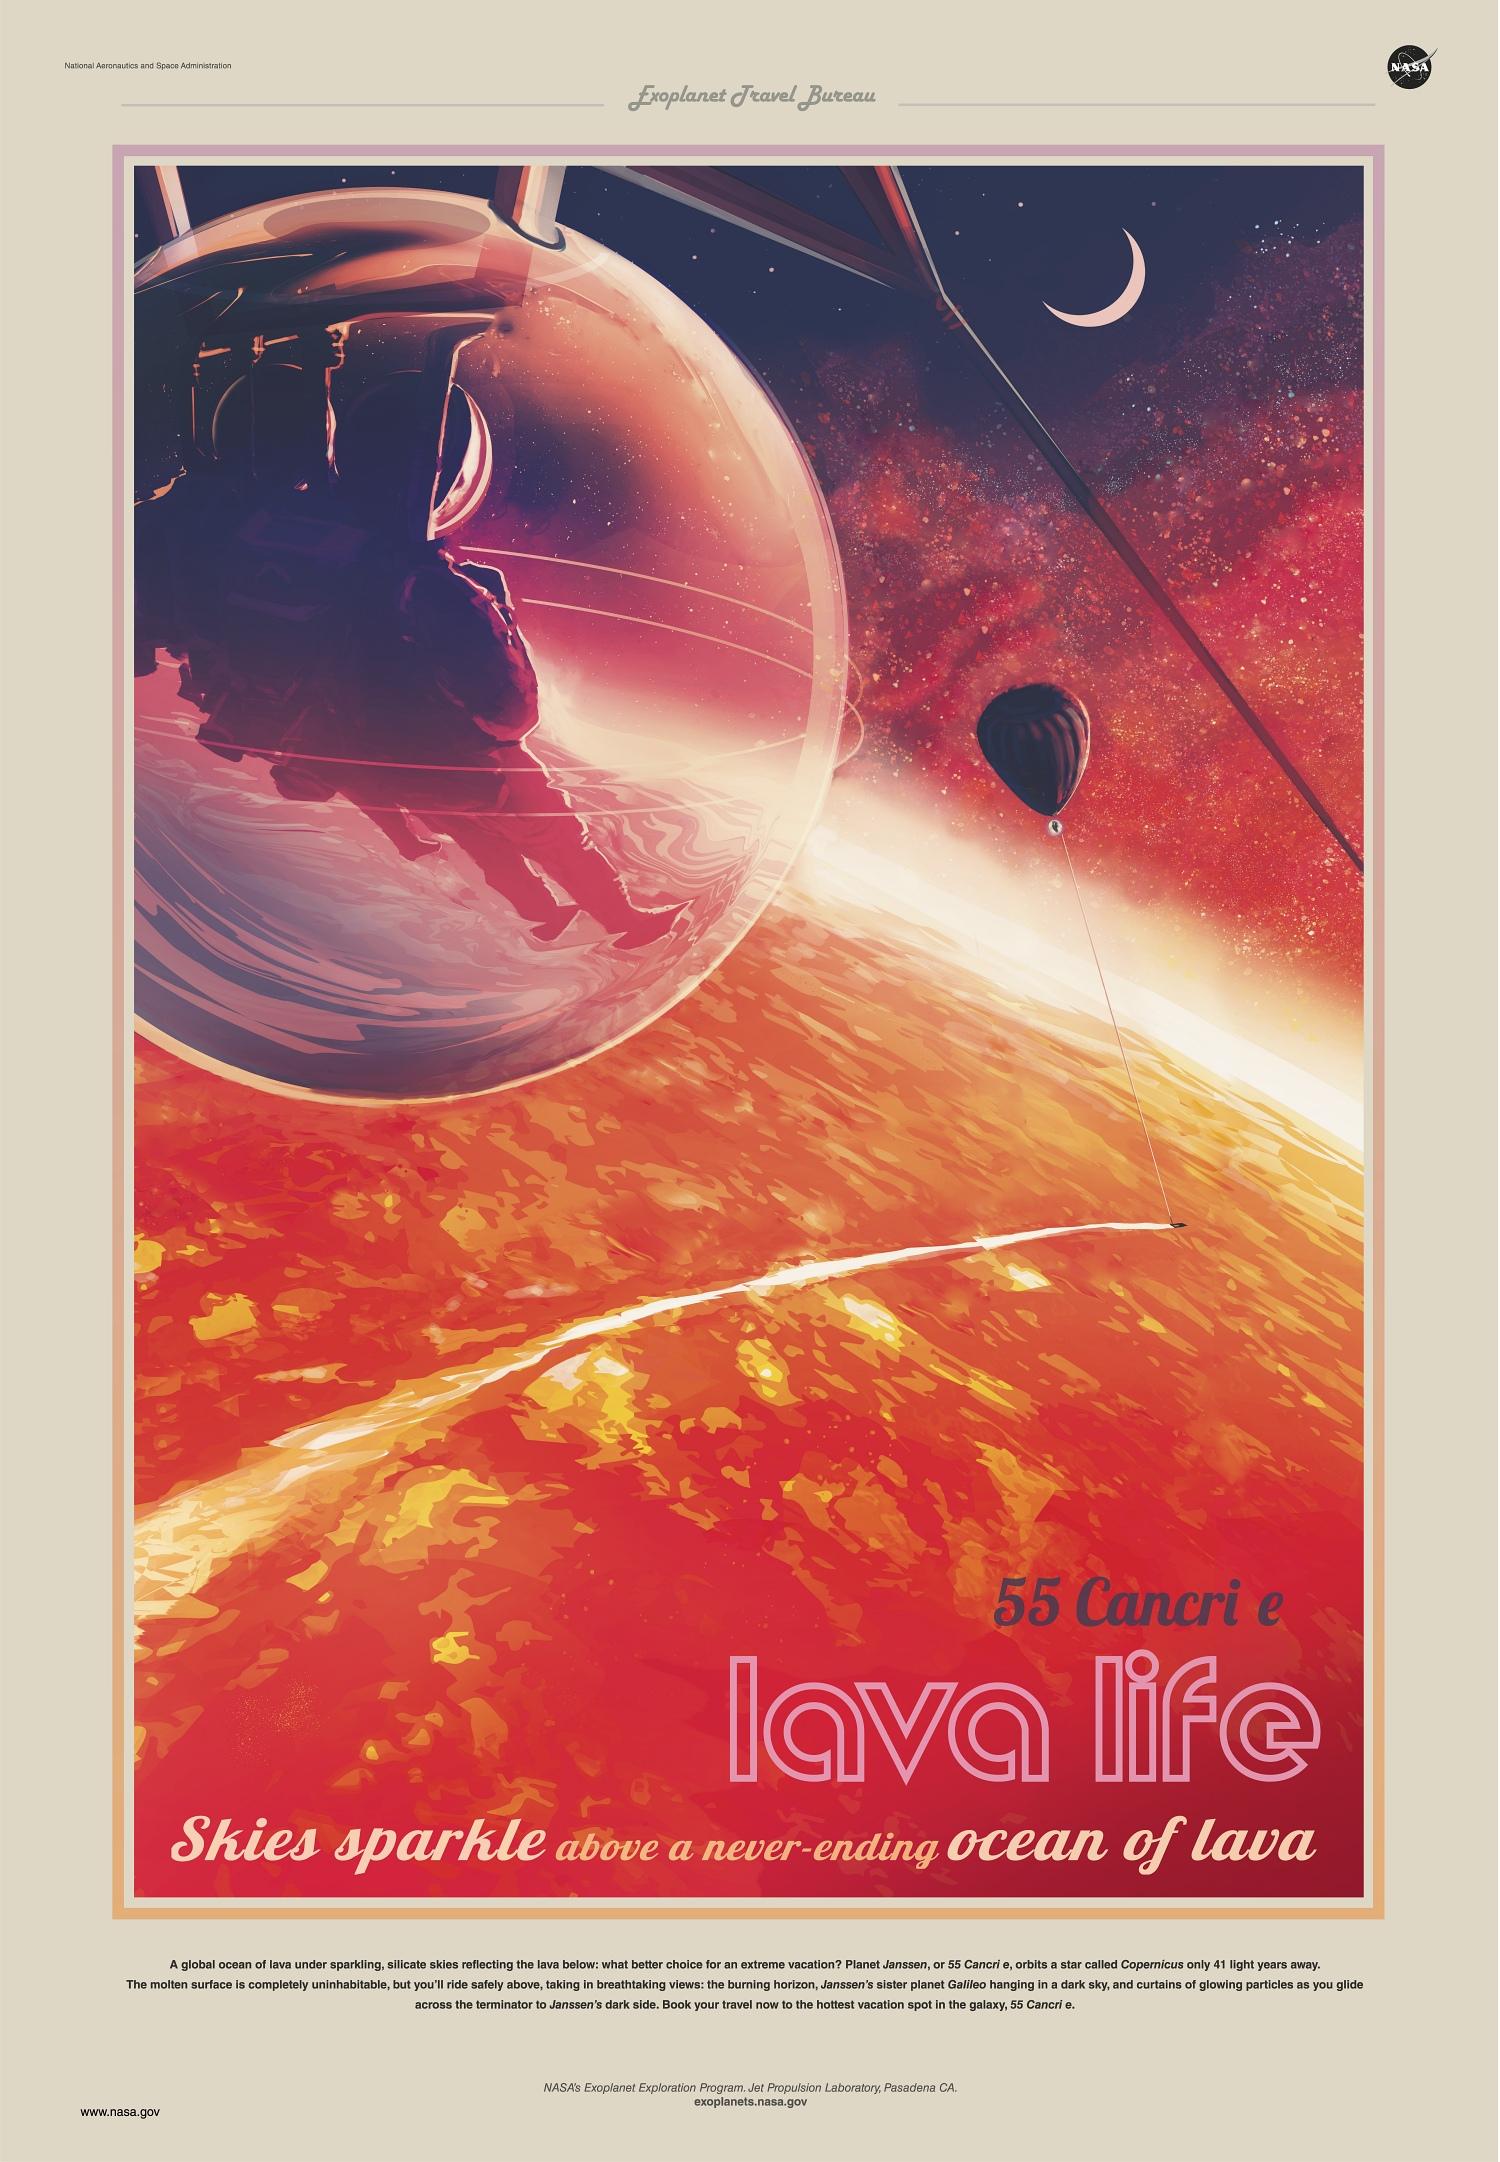 Cancri-e exoplanet travel bureau